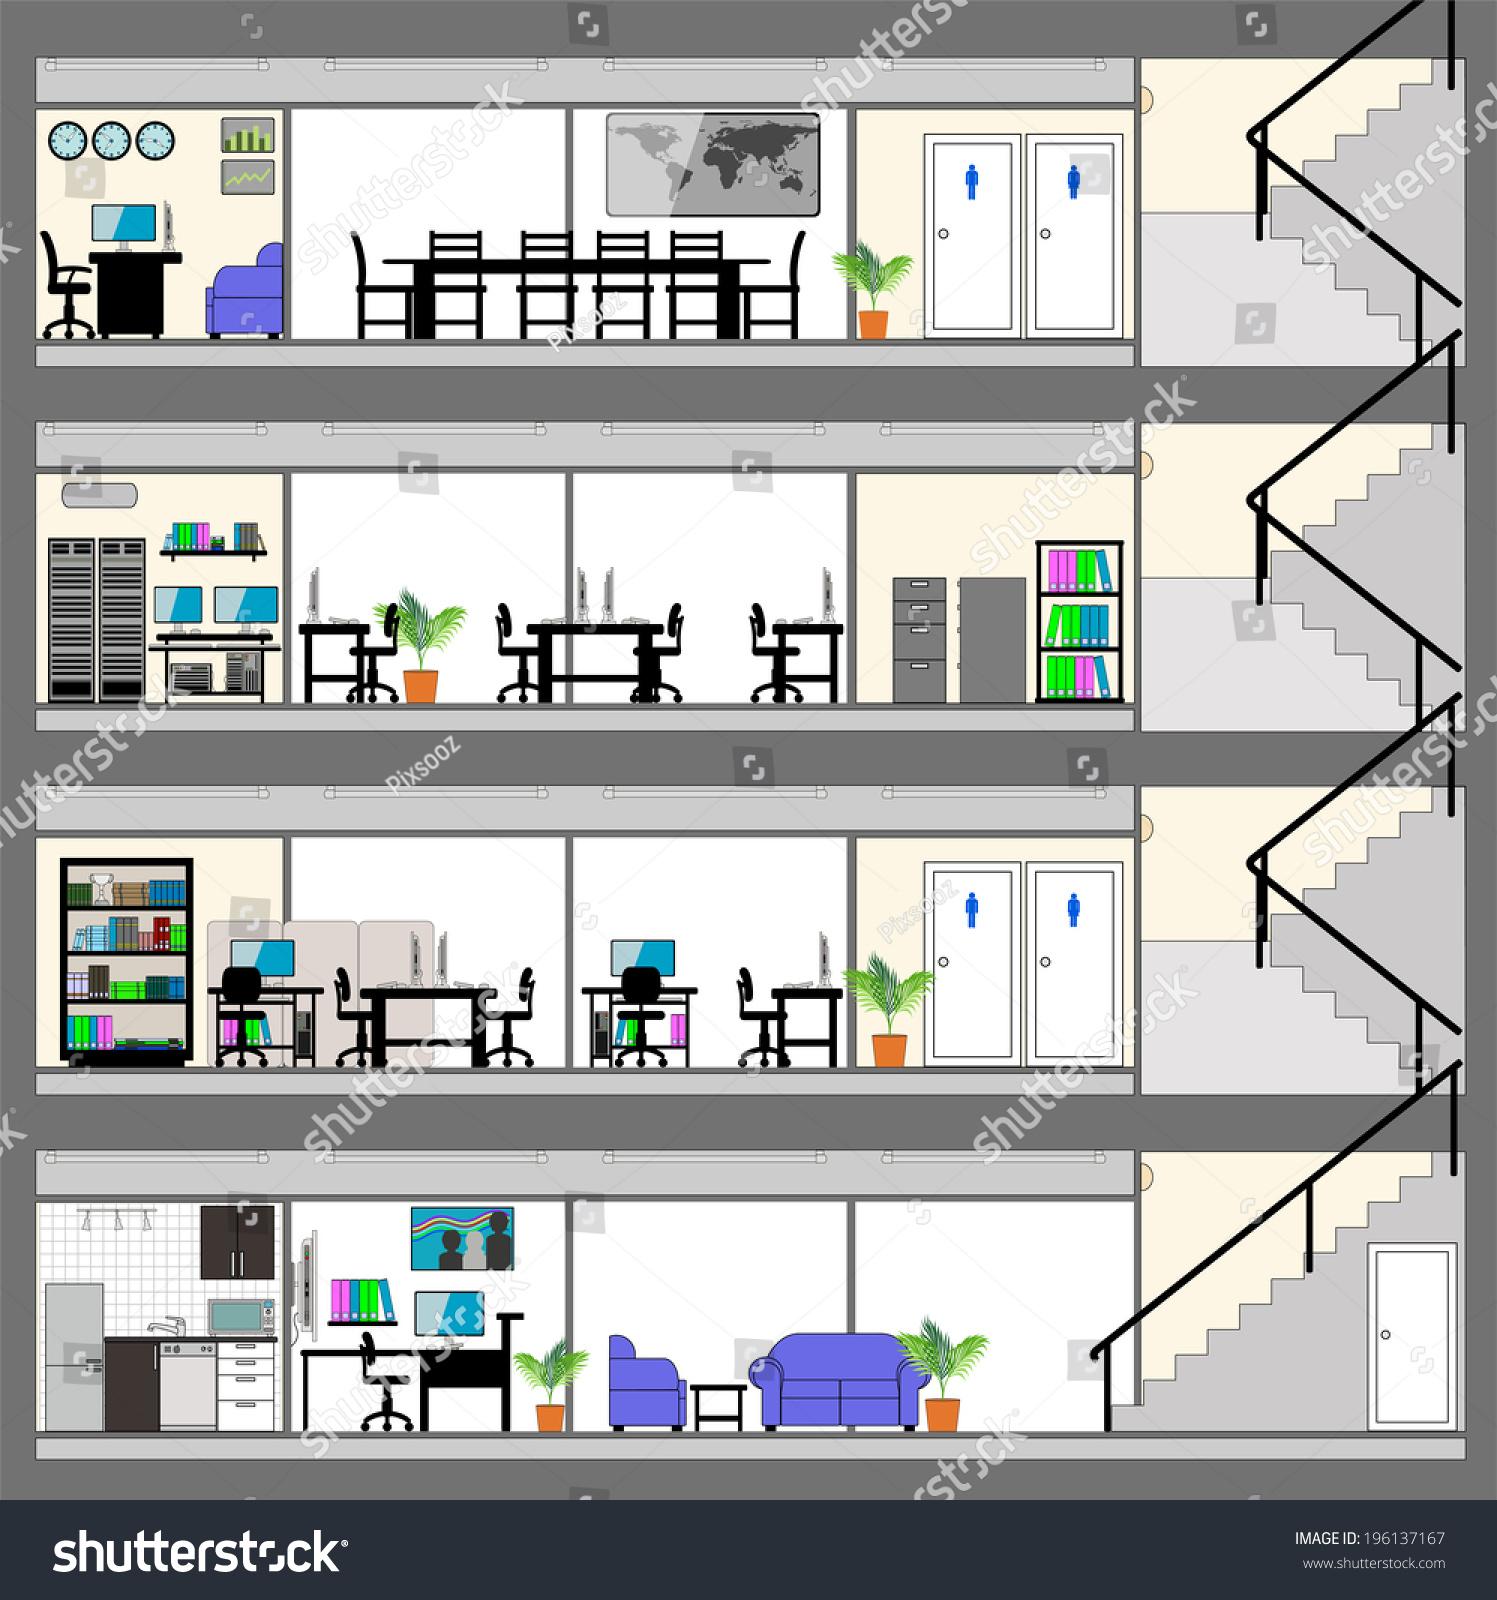 Cutaway office building interior design plan stock vector for Office interior plan